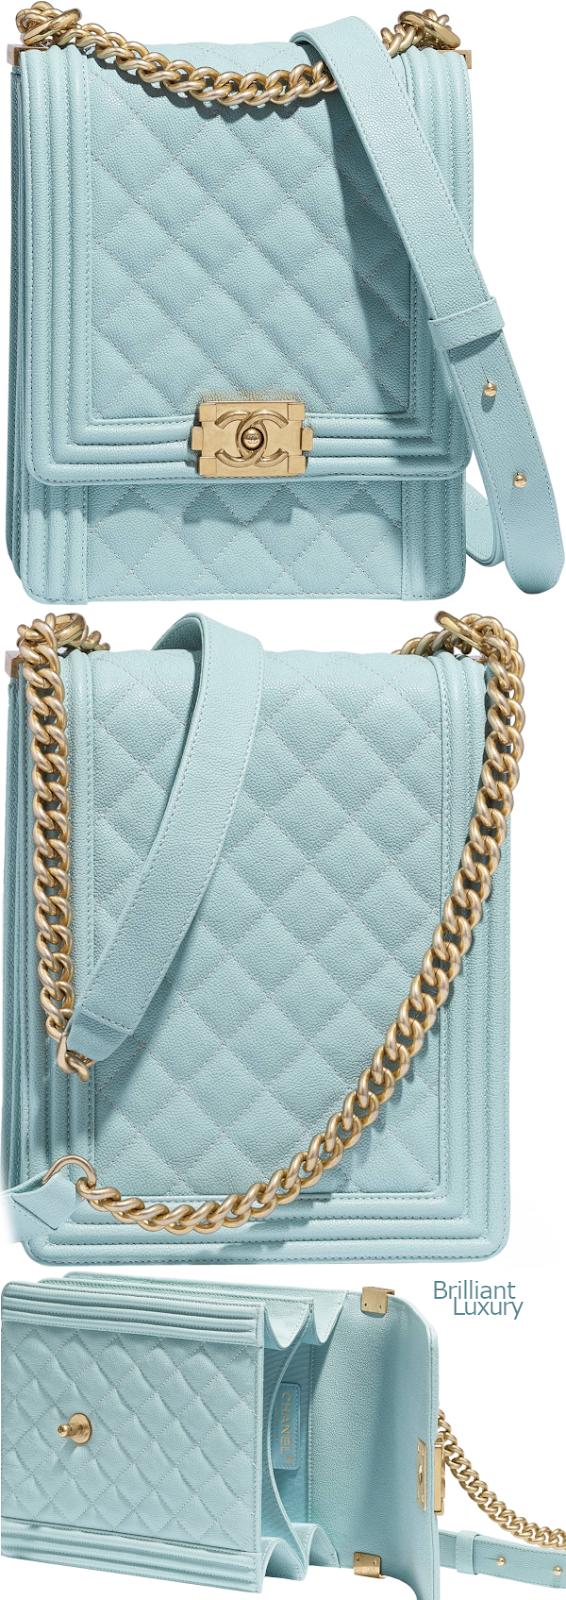 Brilliant Luxury♦Chanel Boy handbag light #blue